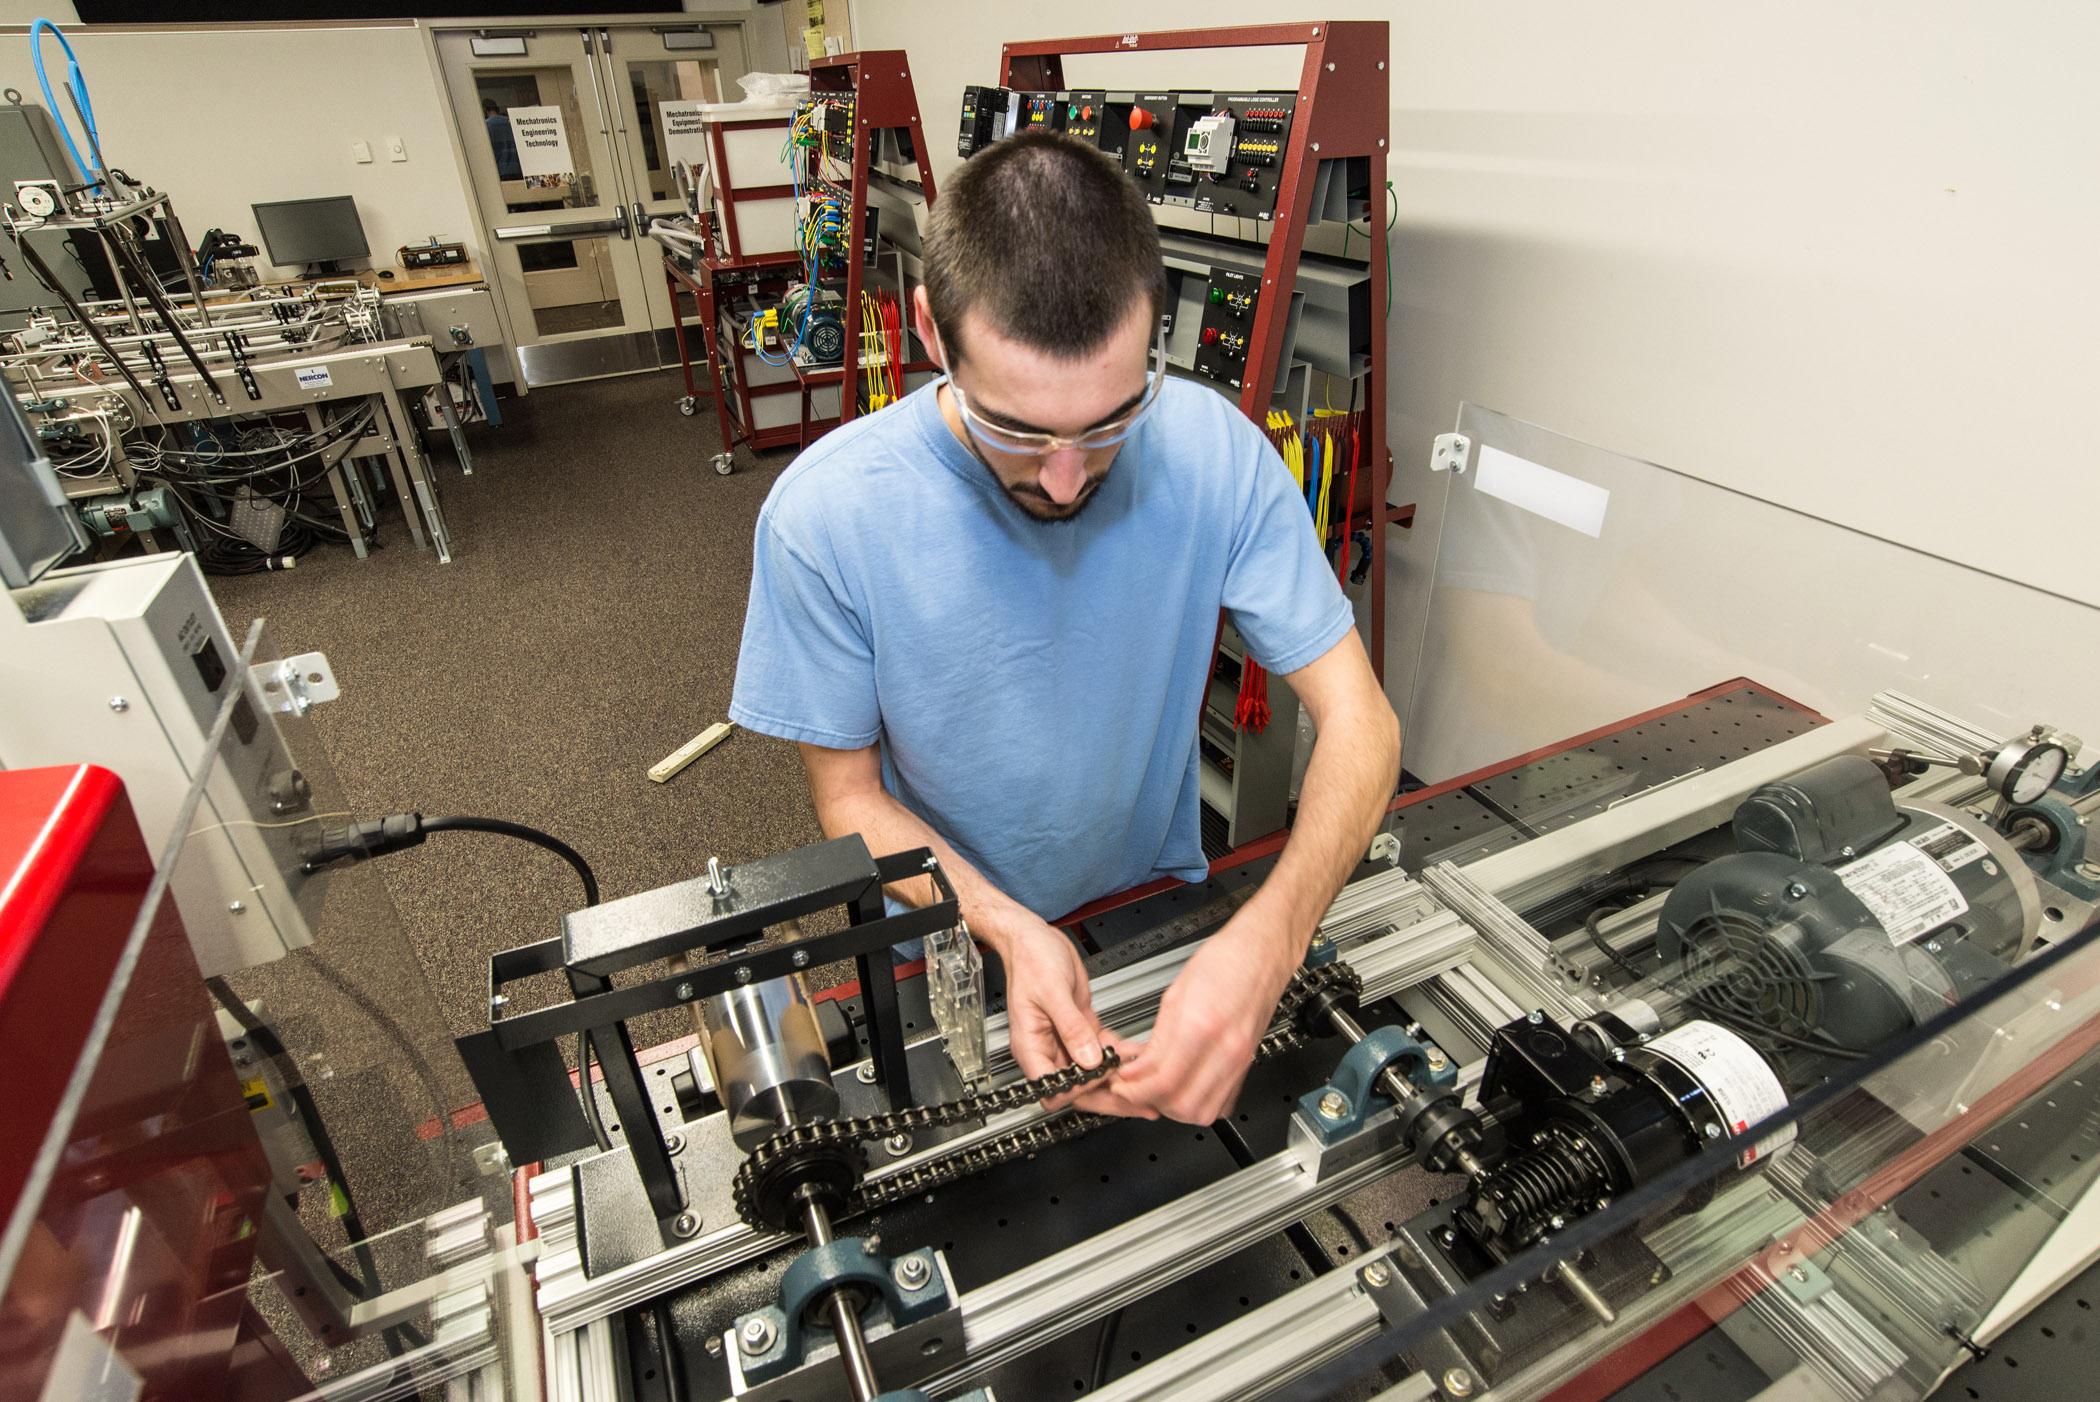 Penn College's new automation technology degrees | News, Sports, Jobs - Williamsport Sun-Gazette